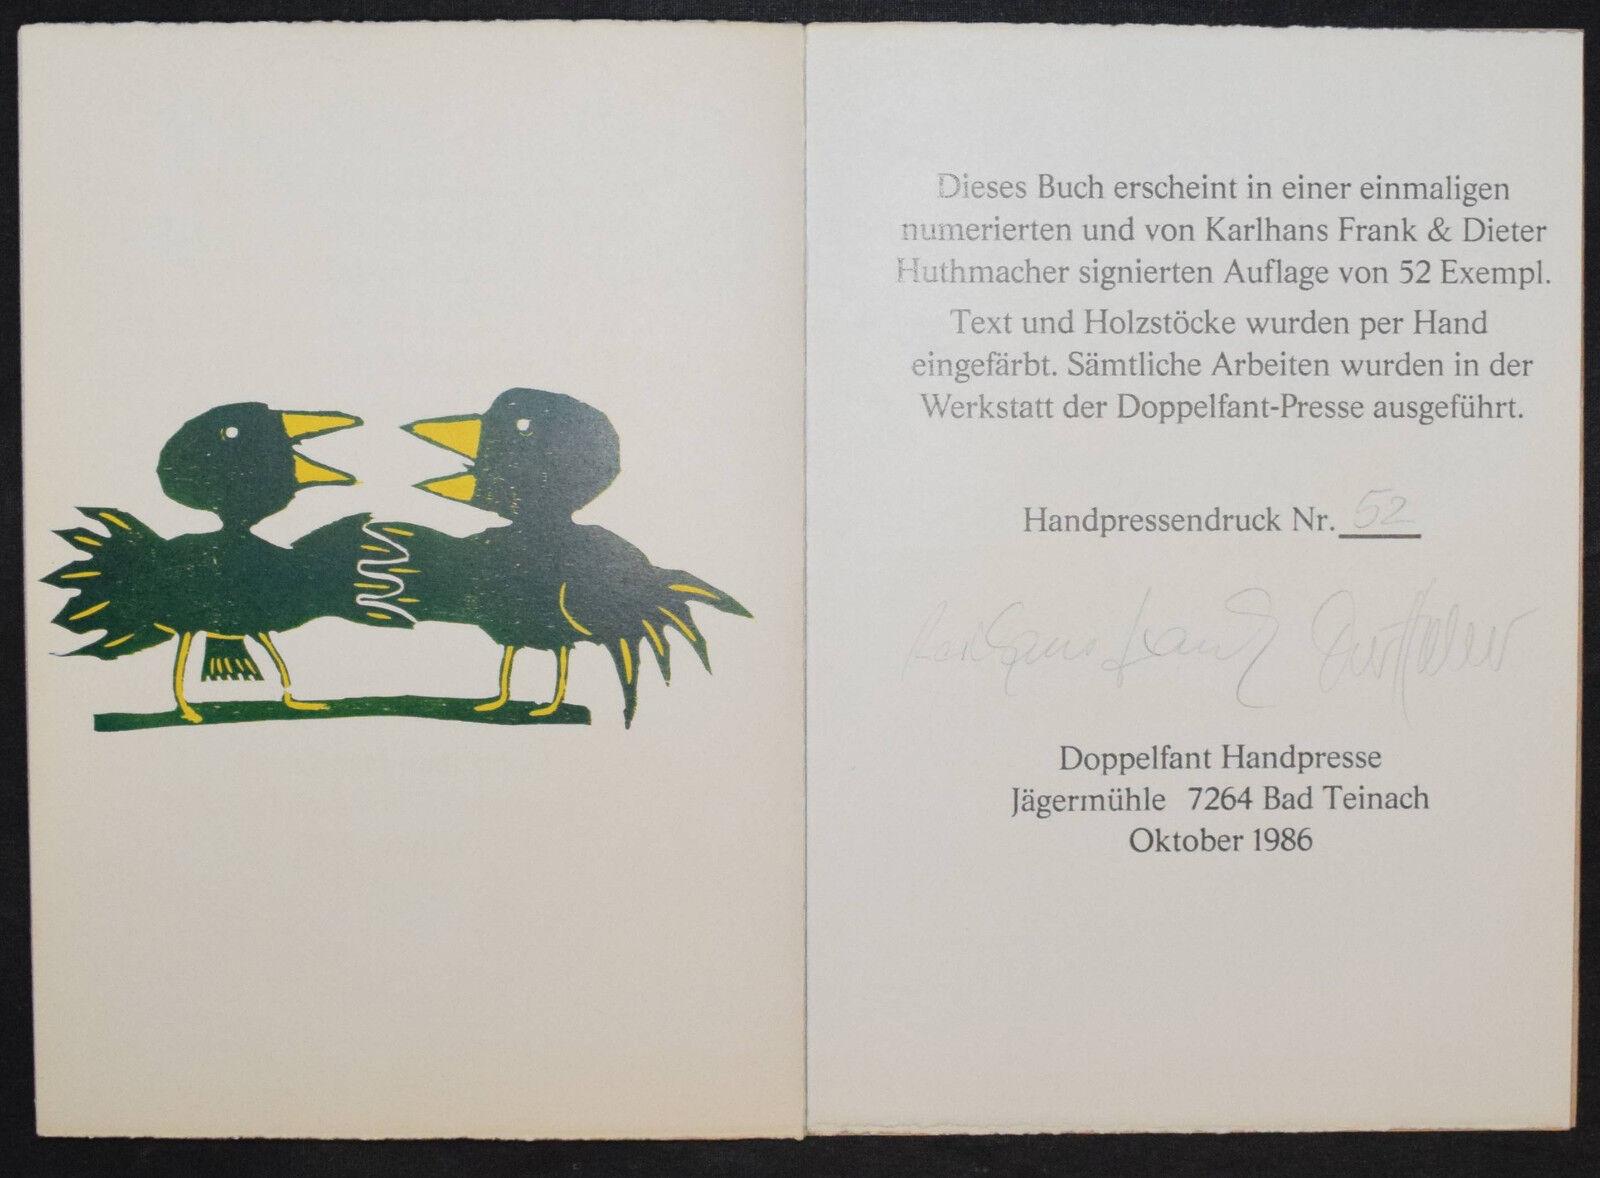 FUNDEVOGEL - 1986 - KARLHANS FRANK - D. HUTHMACHER - SIGNIERT - NUMMERIERT